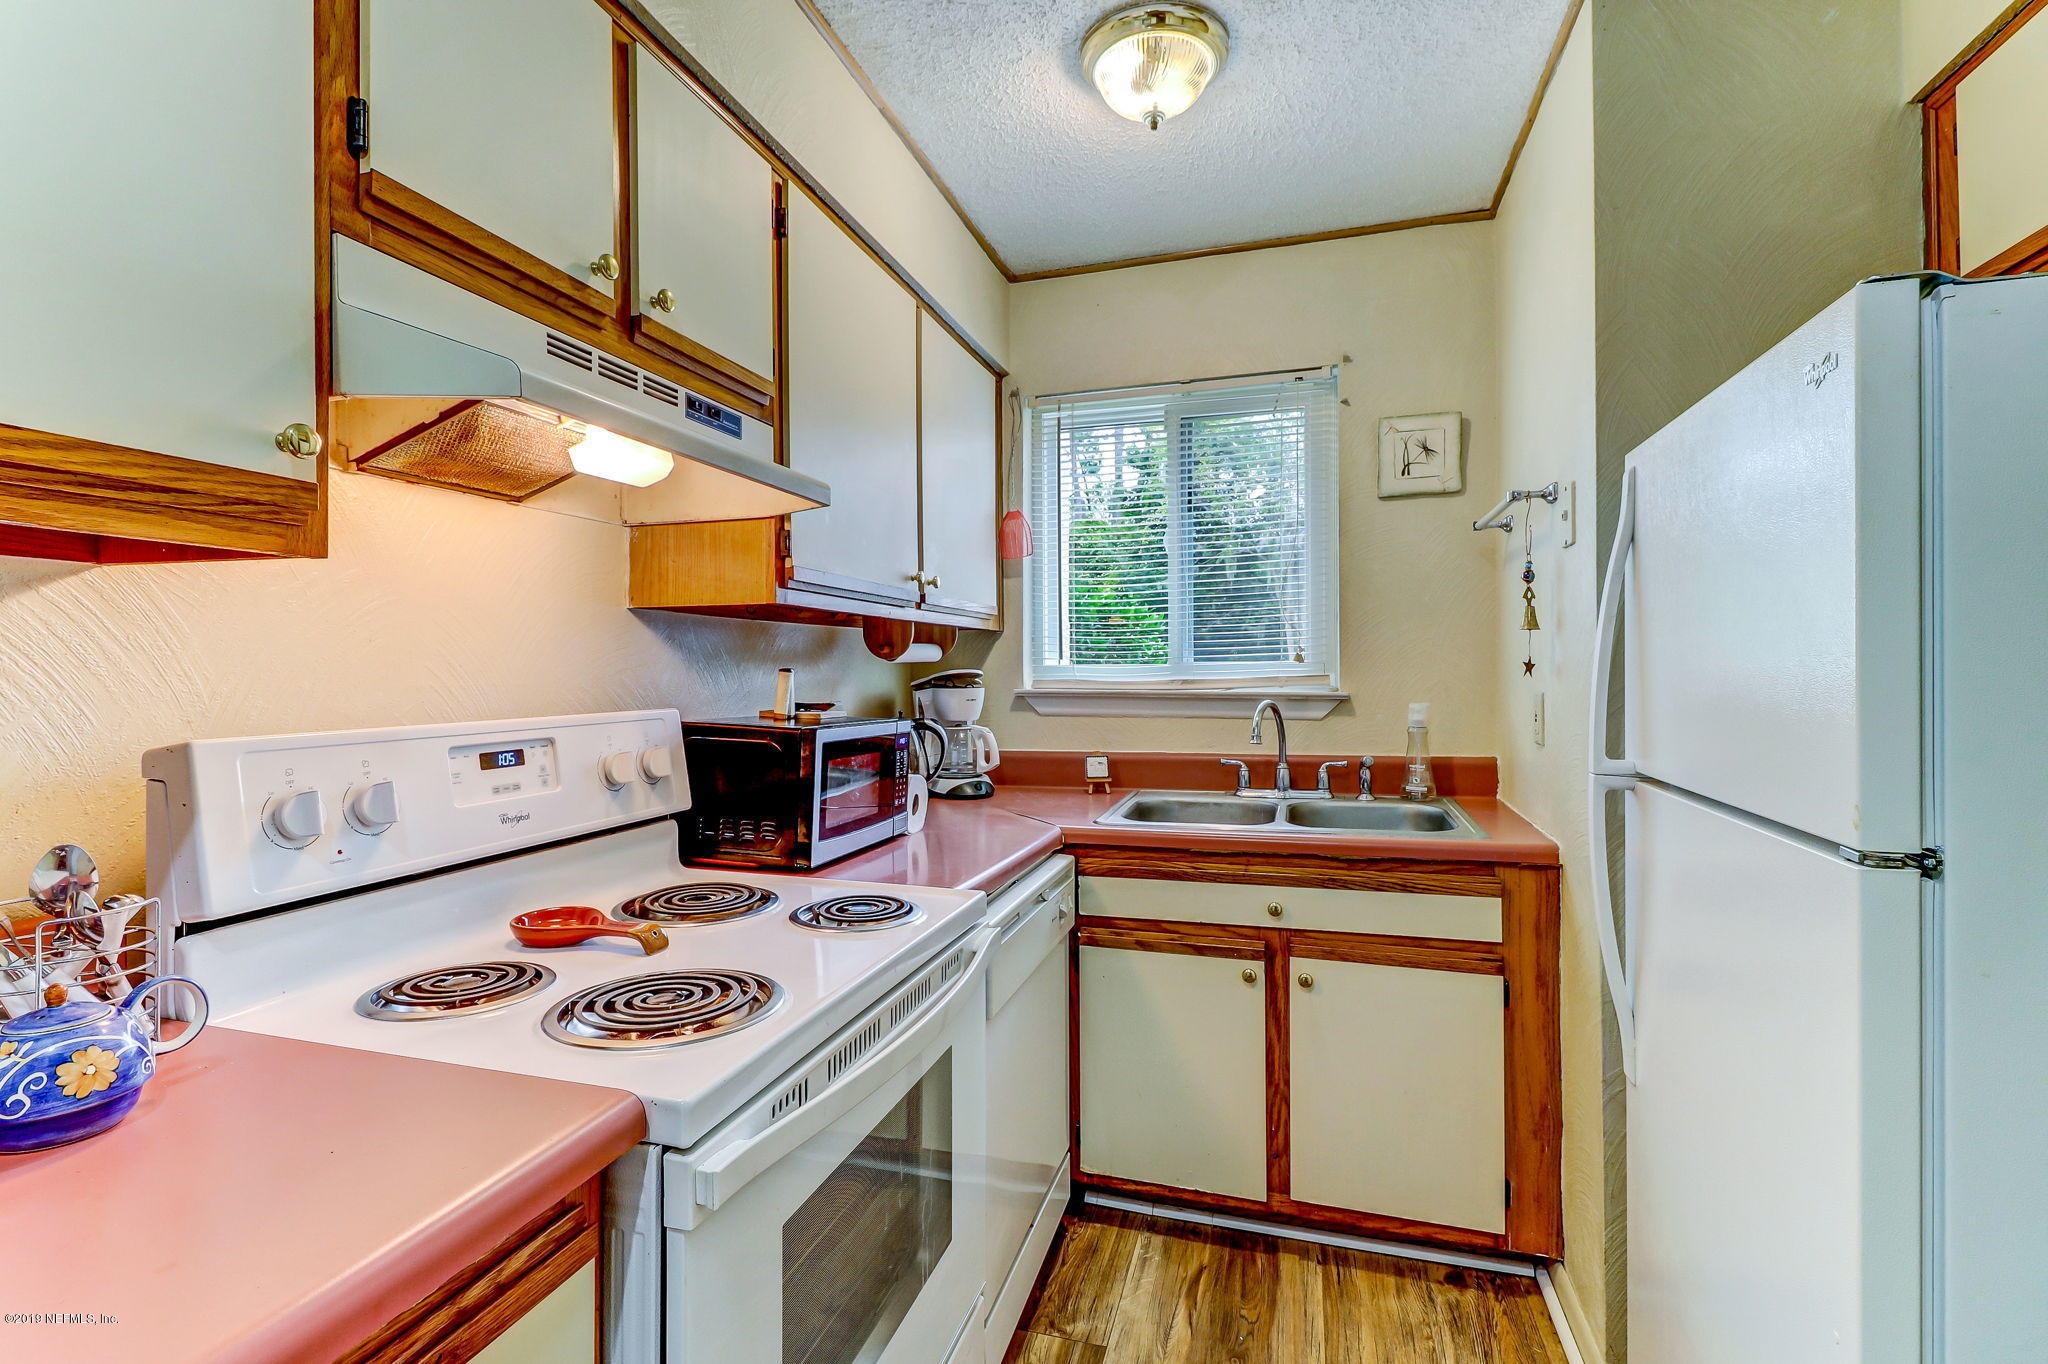 123 HIRTH- FERNANDINA BEACH- FLORIDA 32034, 2 Bedrooms Bedrooms, ,1 BathroomBathrooms,Condo,For sale,HIRTH,1022600